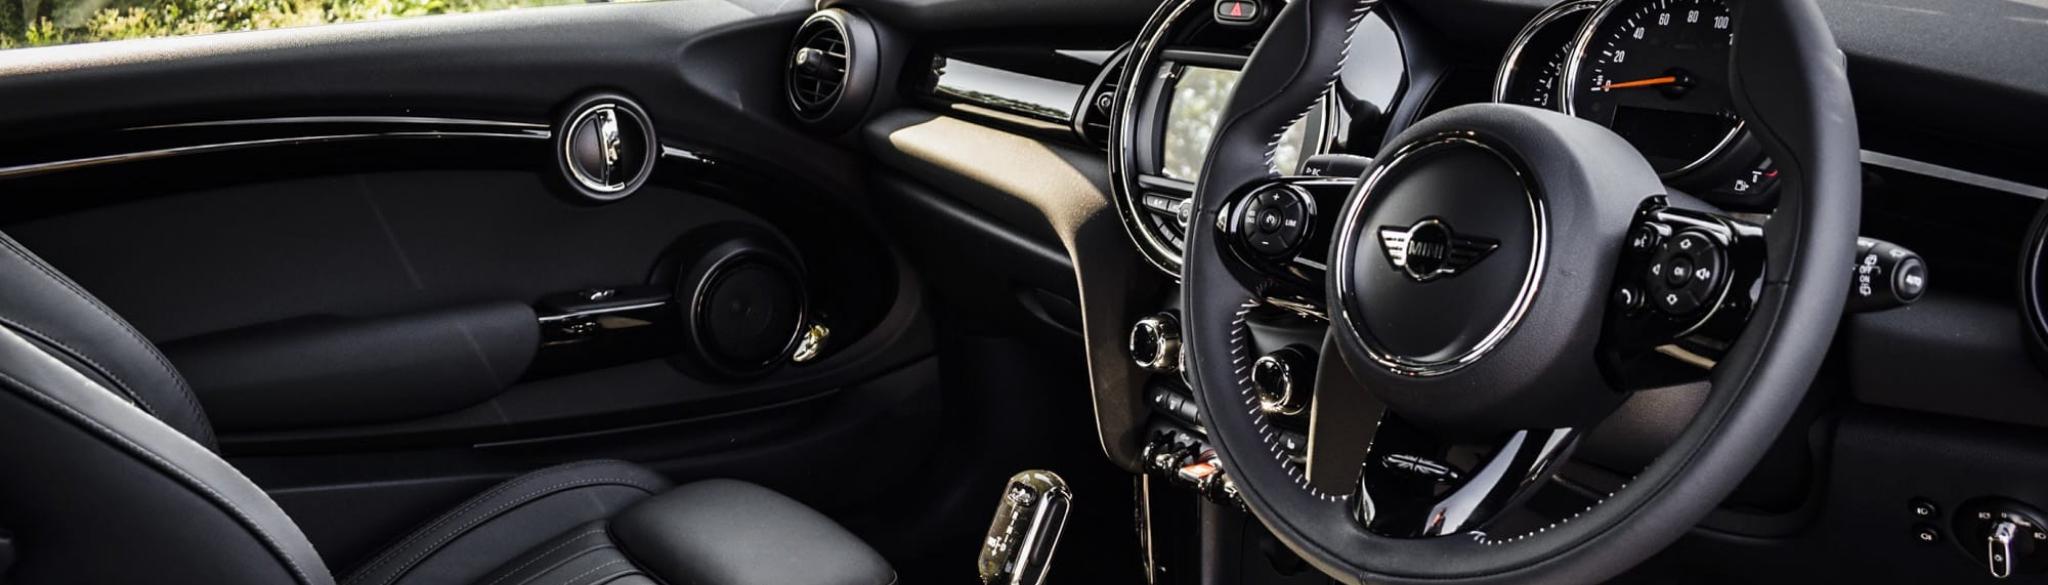 Burgundy Hatch Cooper Special Edition